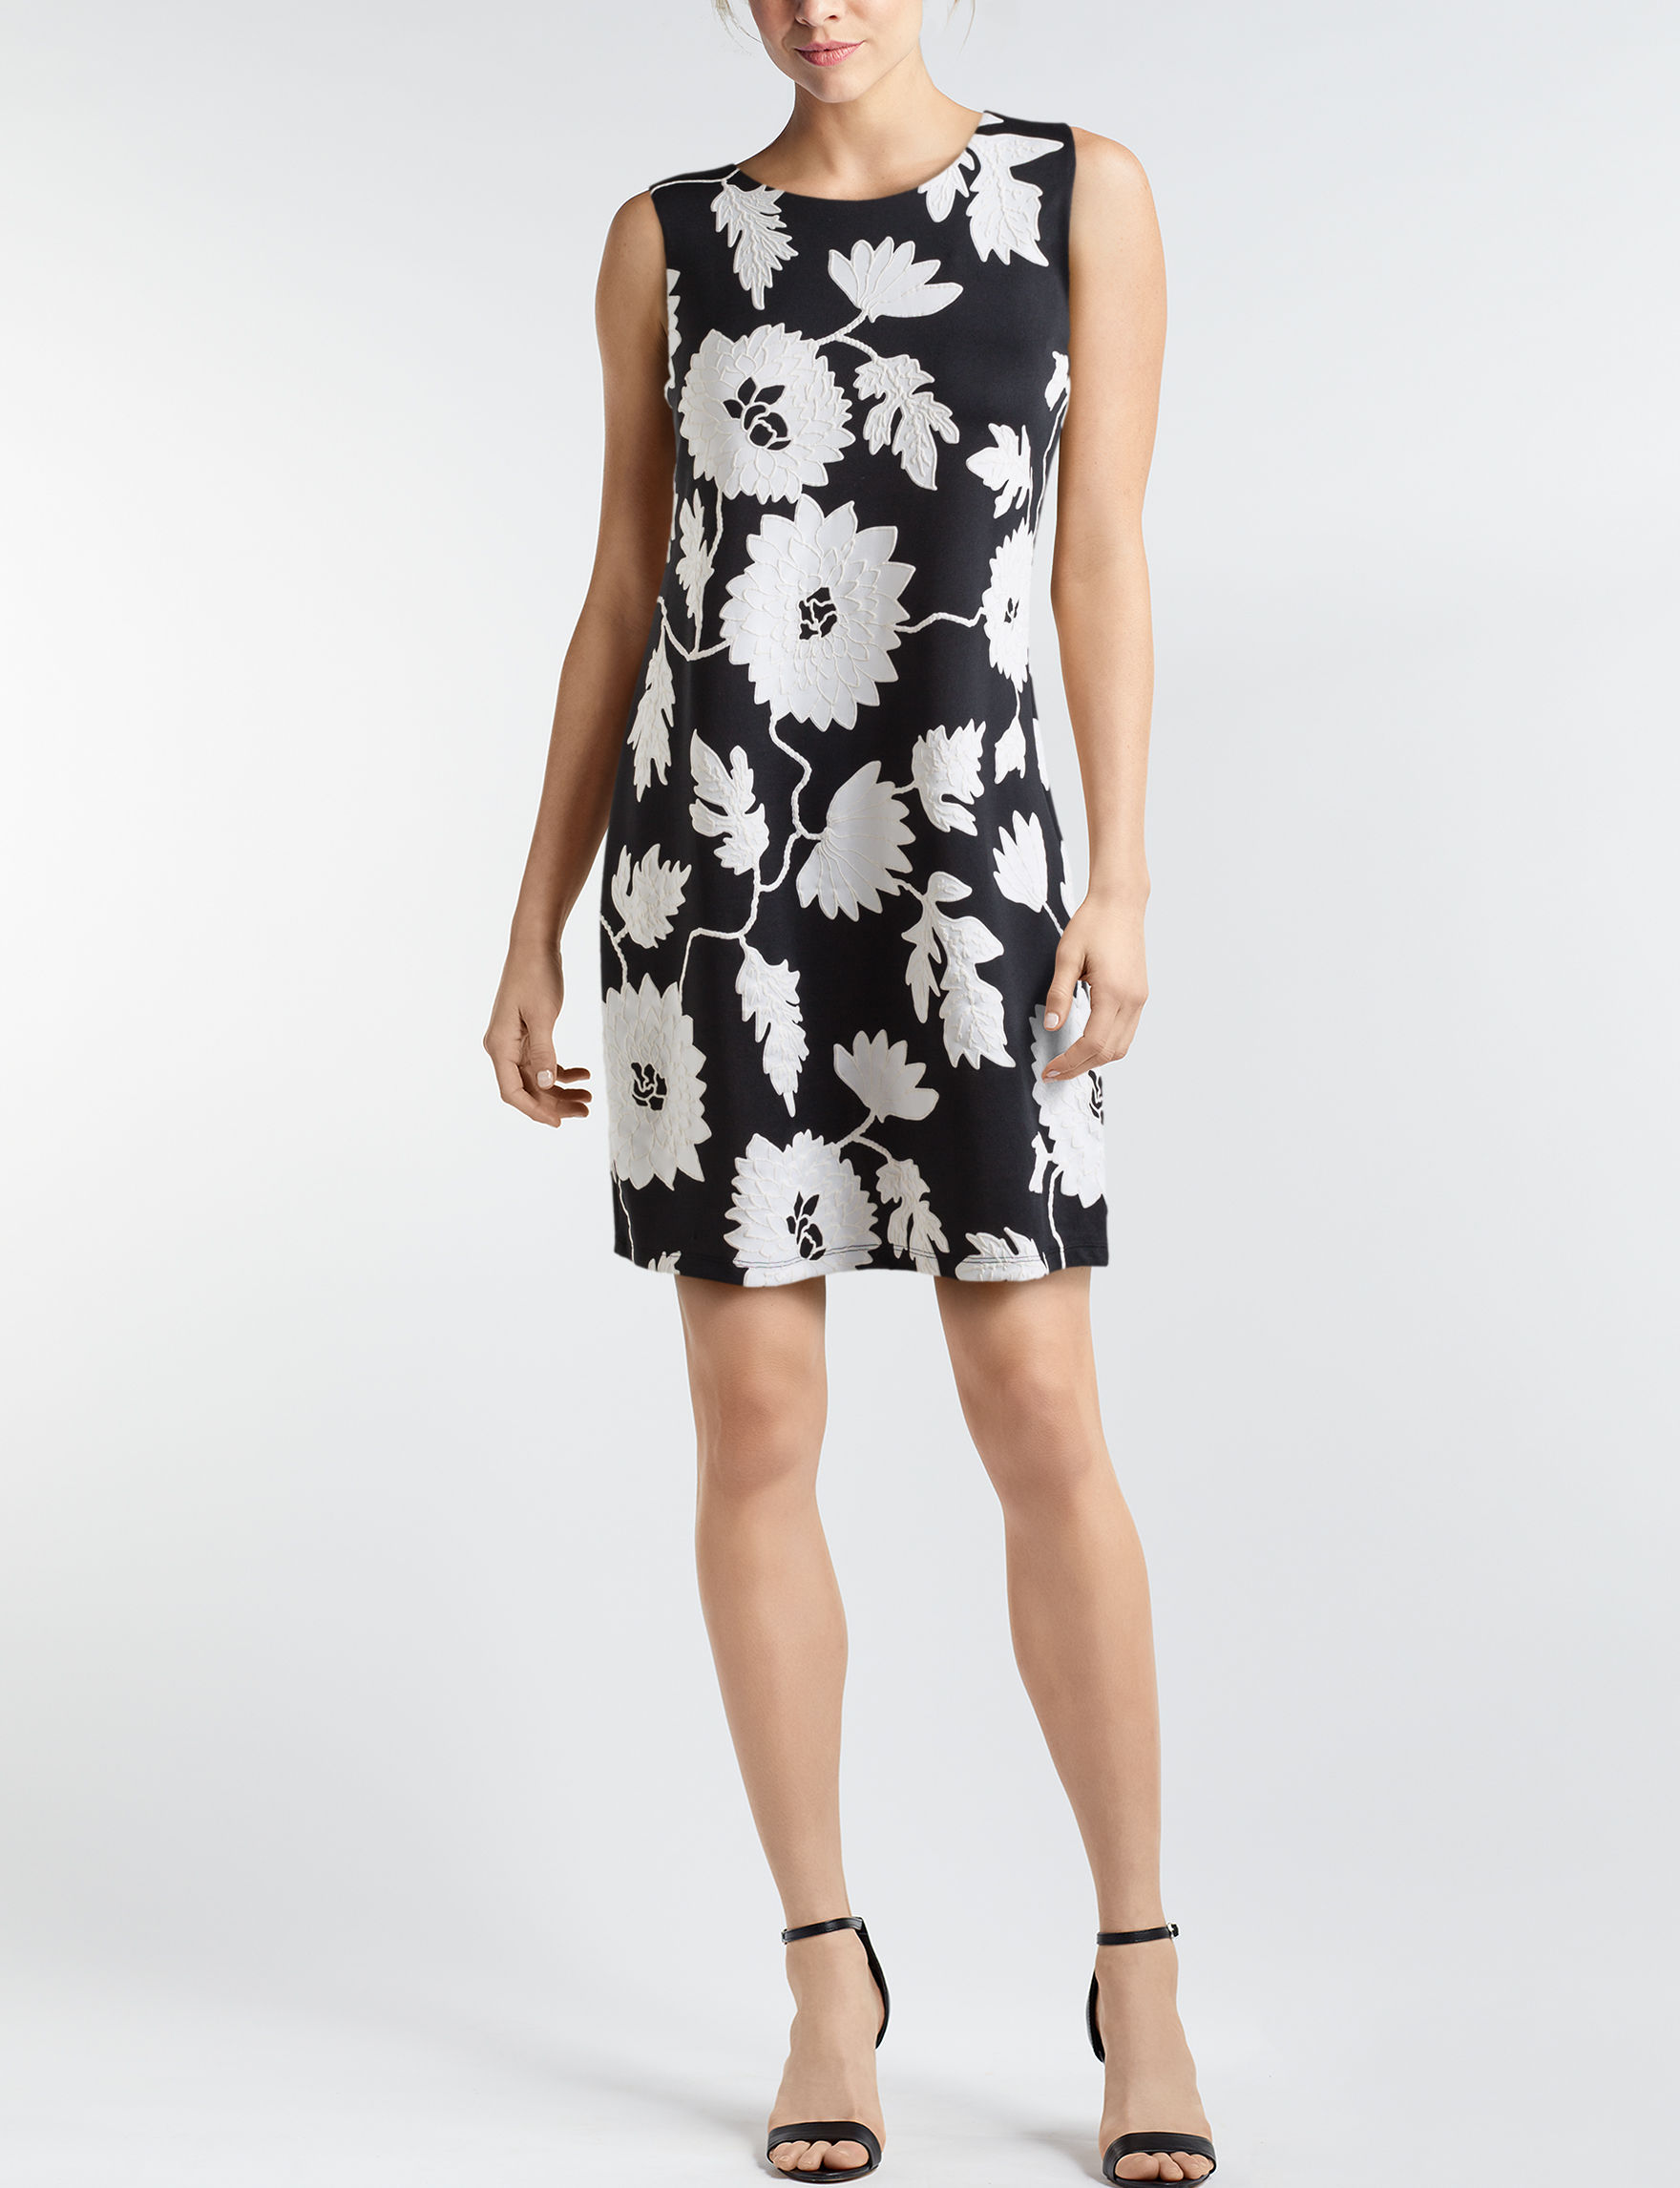 Ronni Nicole Black White Everyday & Casual Sheath Dresses